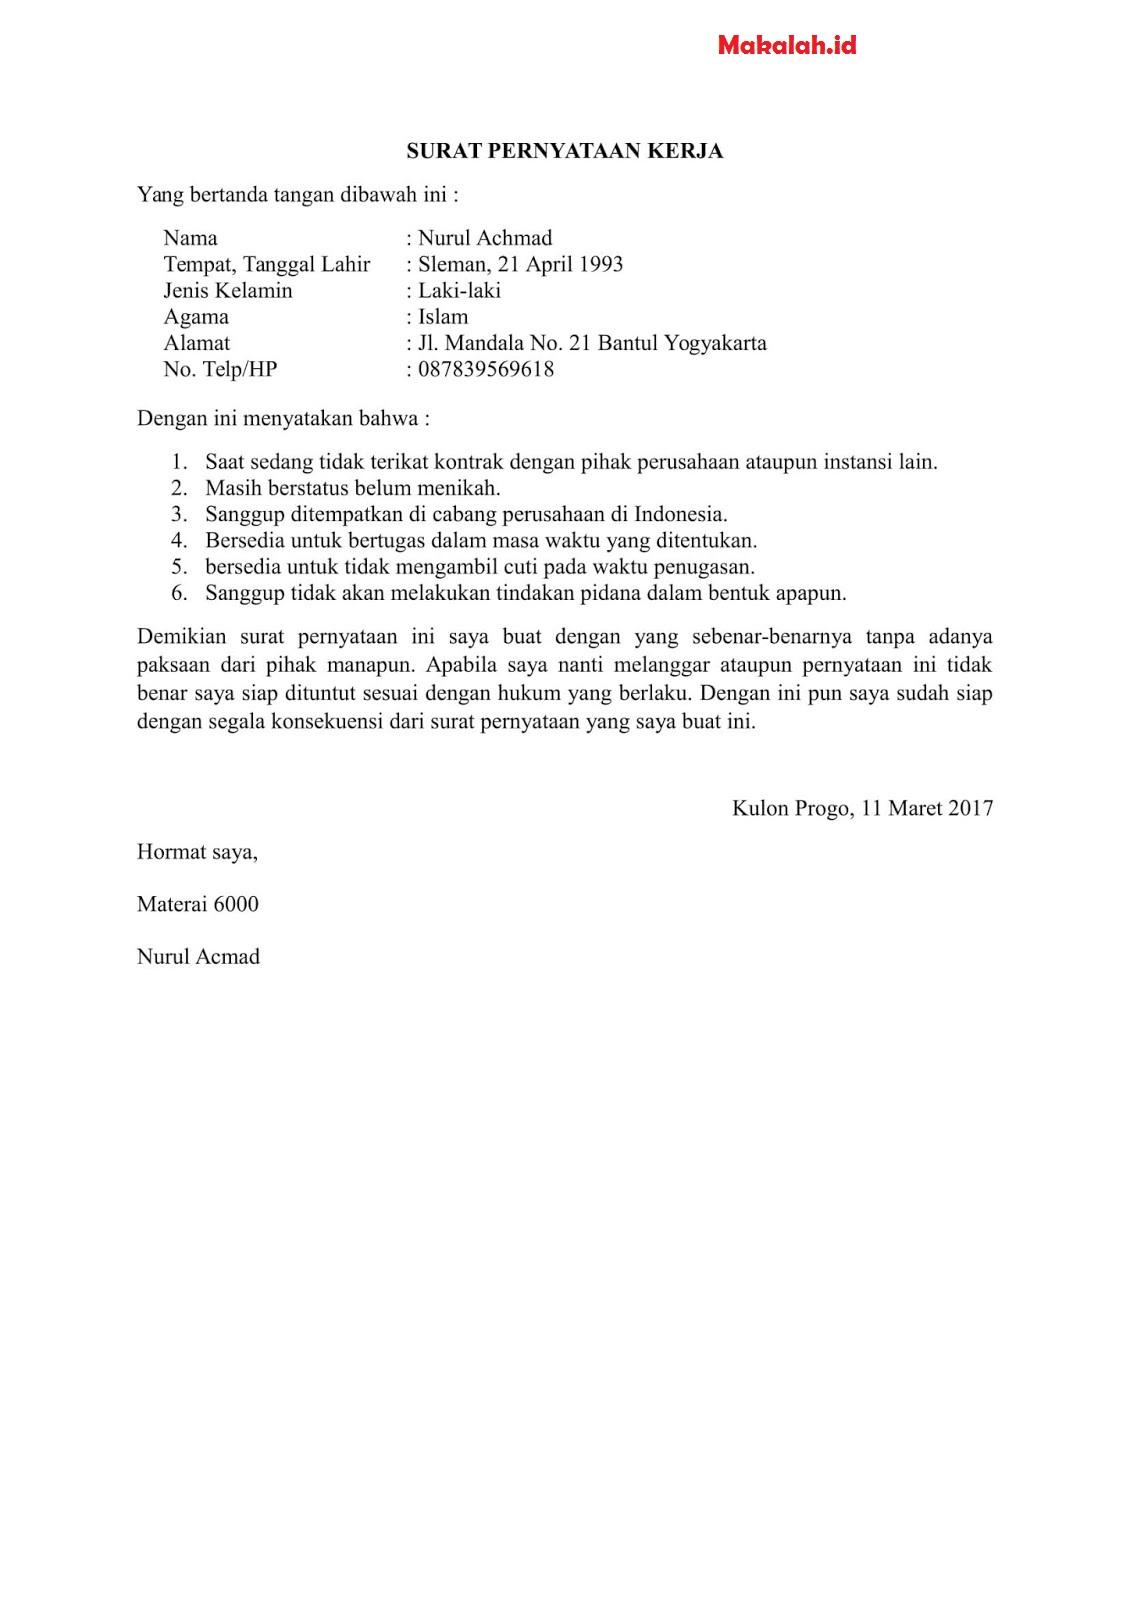 4 contoh surat pernyataan kerja dengan format berbagai